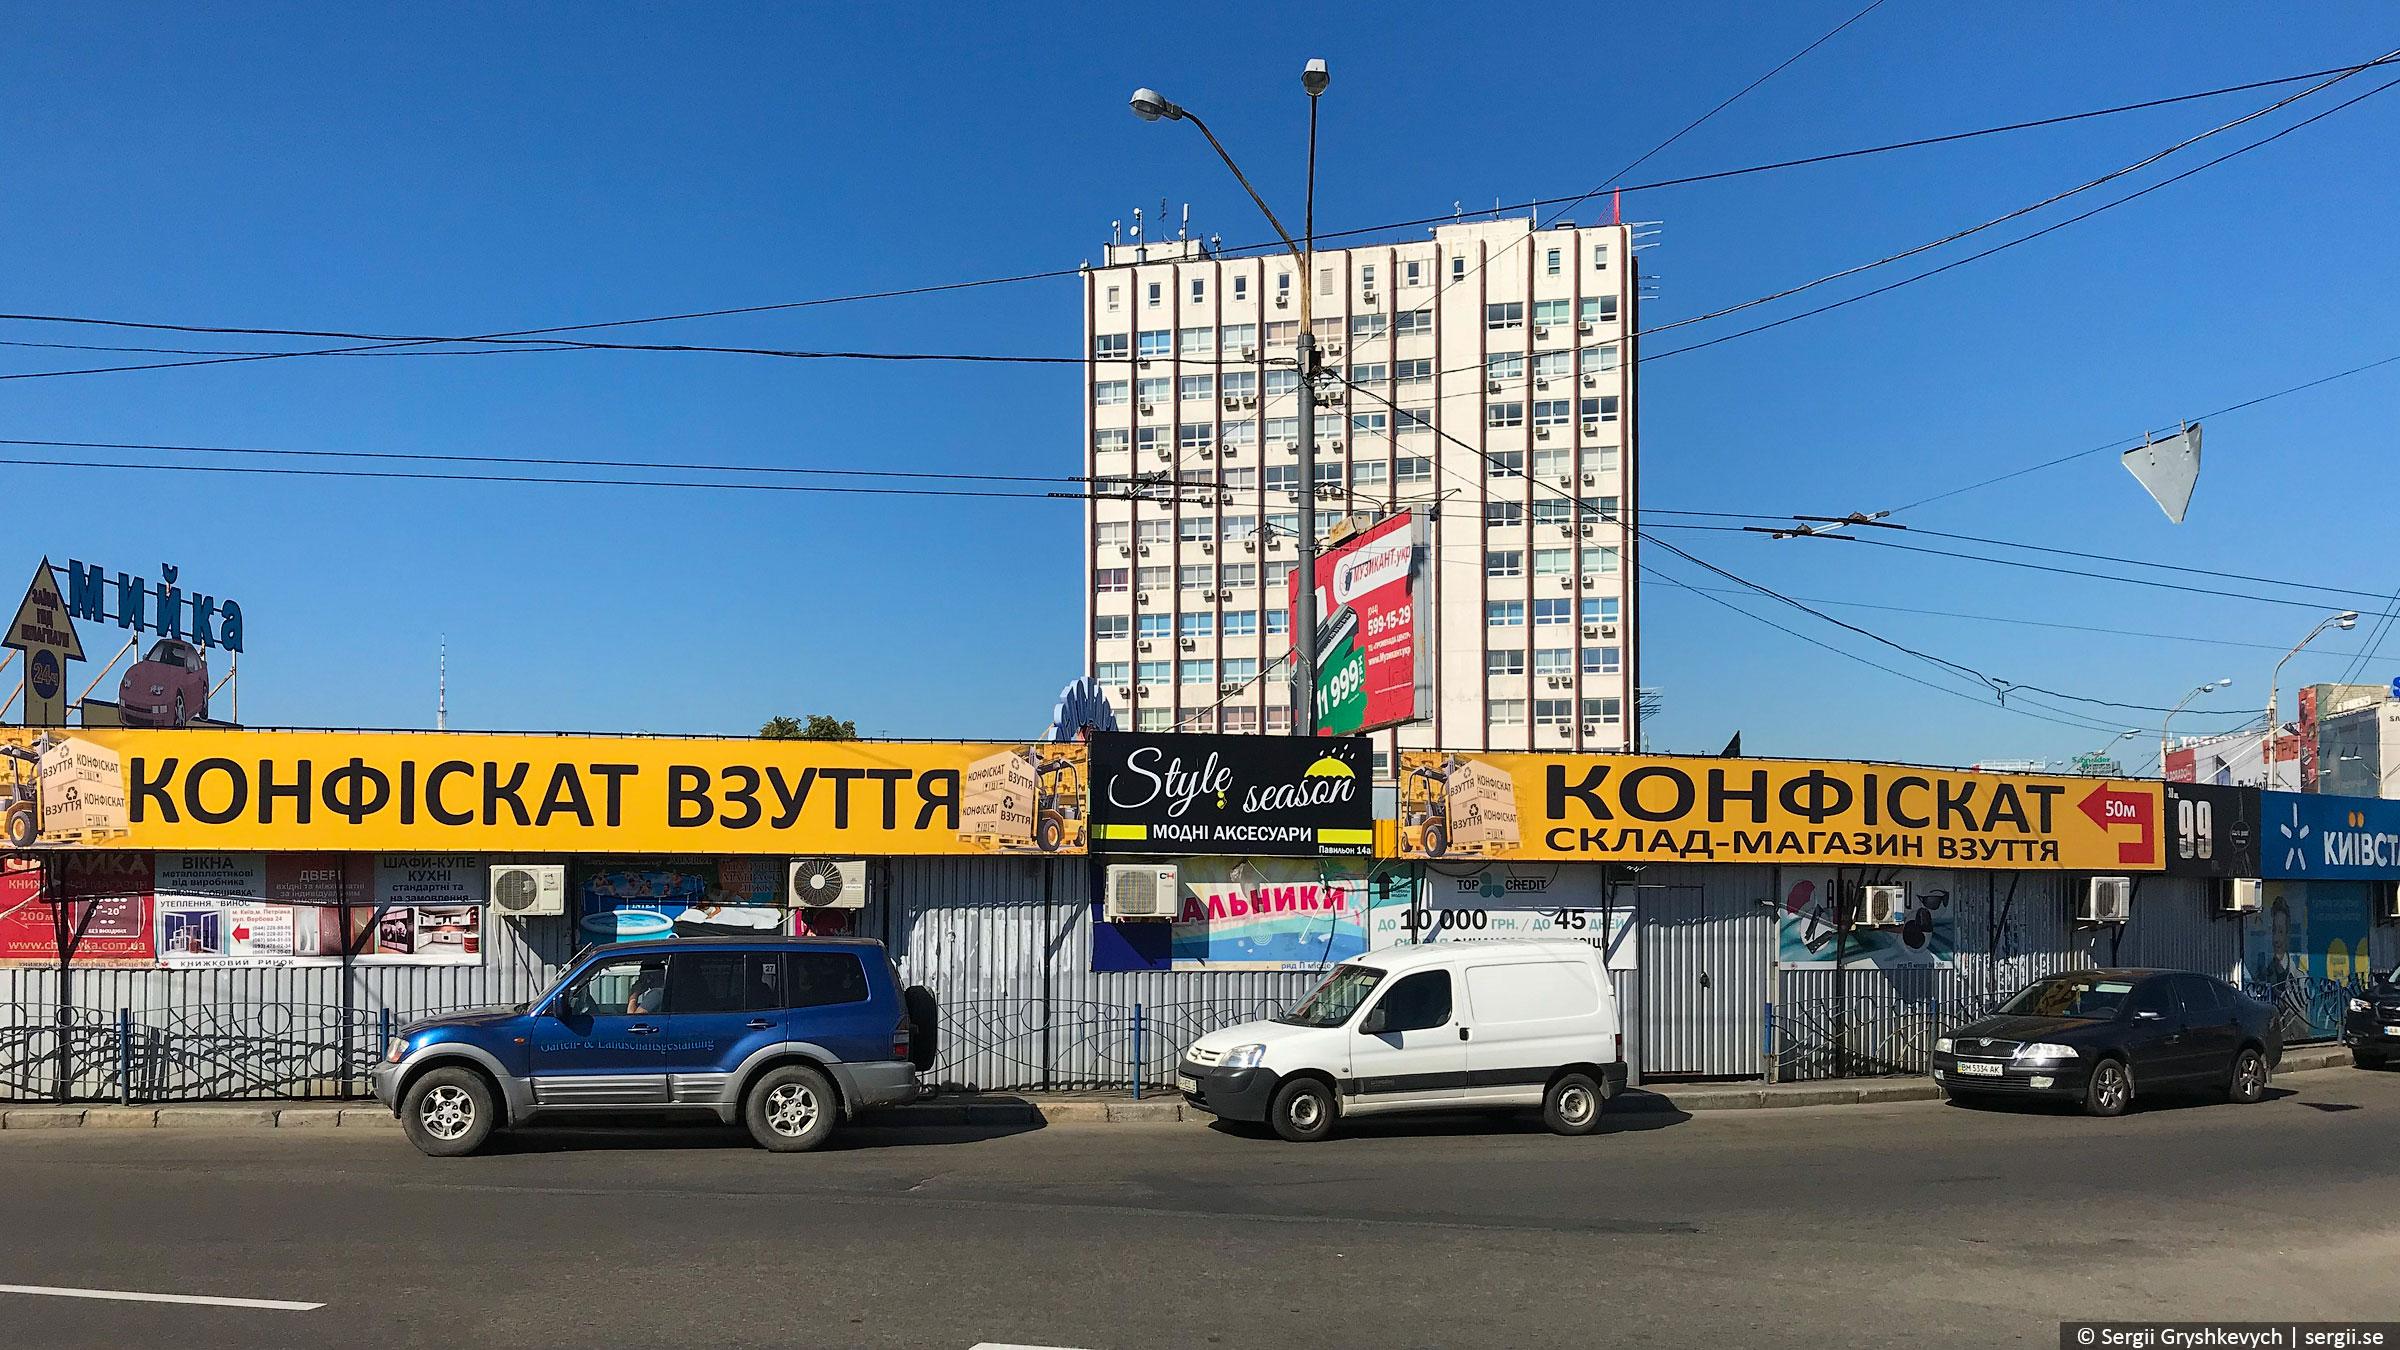 kyiv-ukraine-2018-77